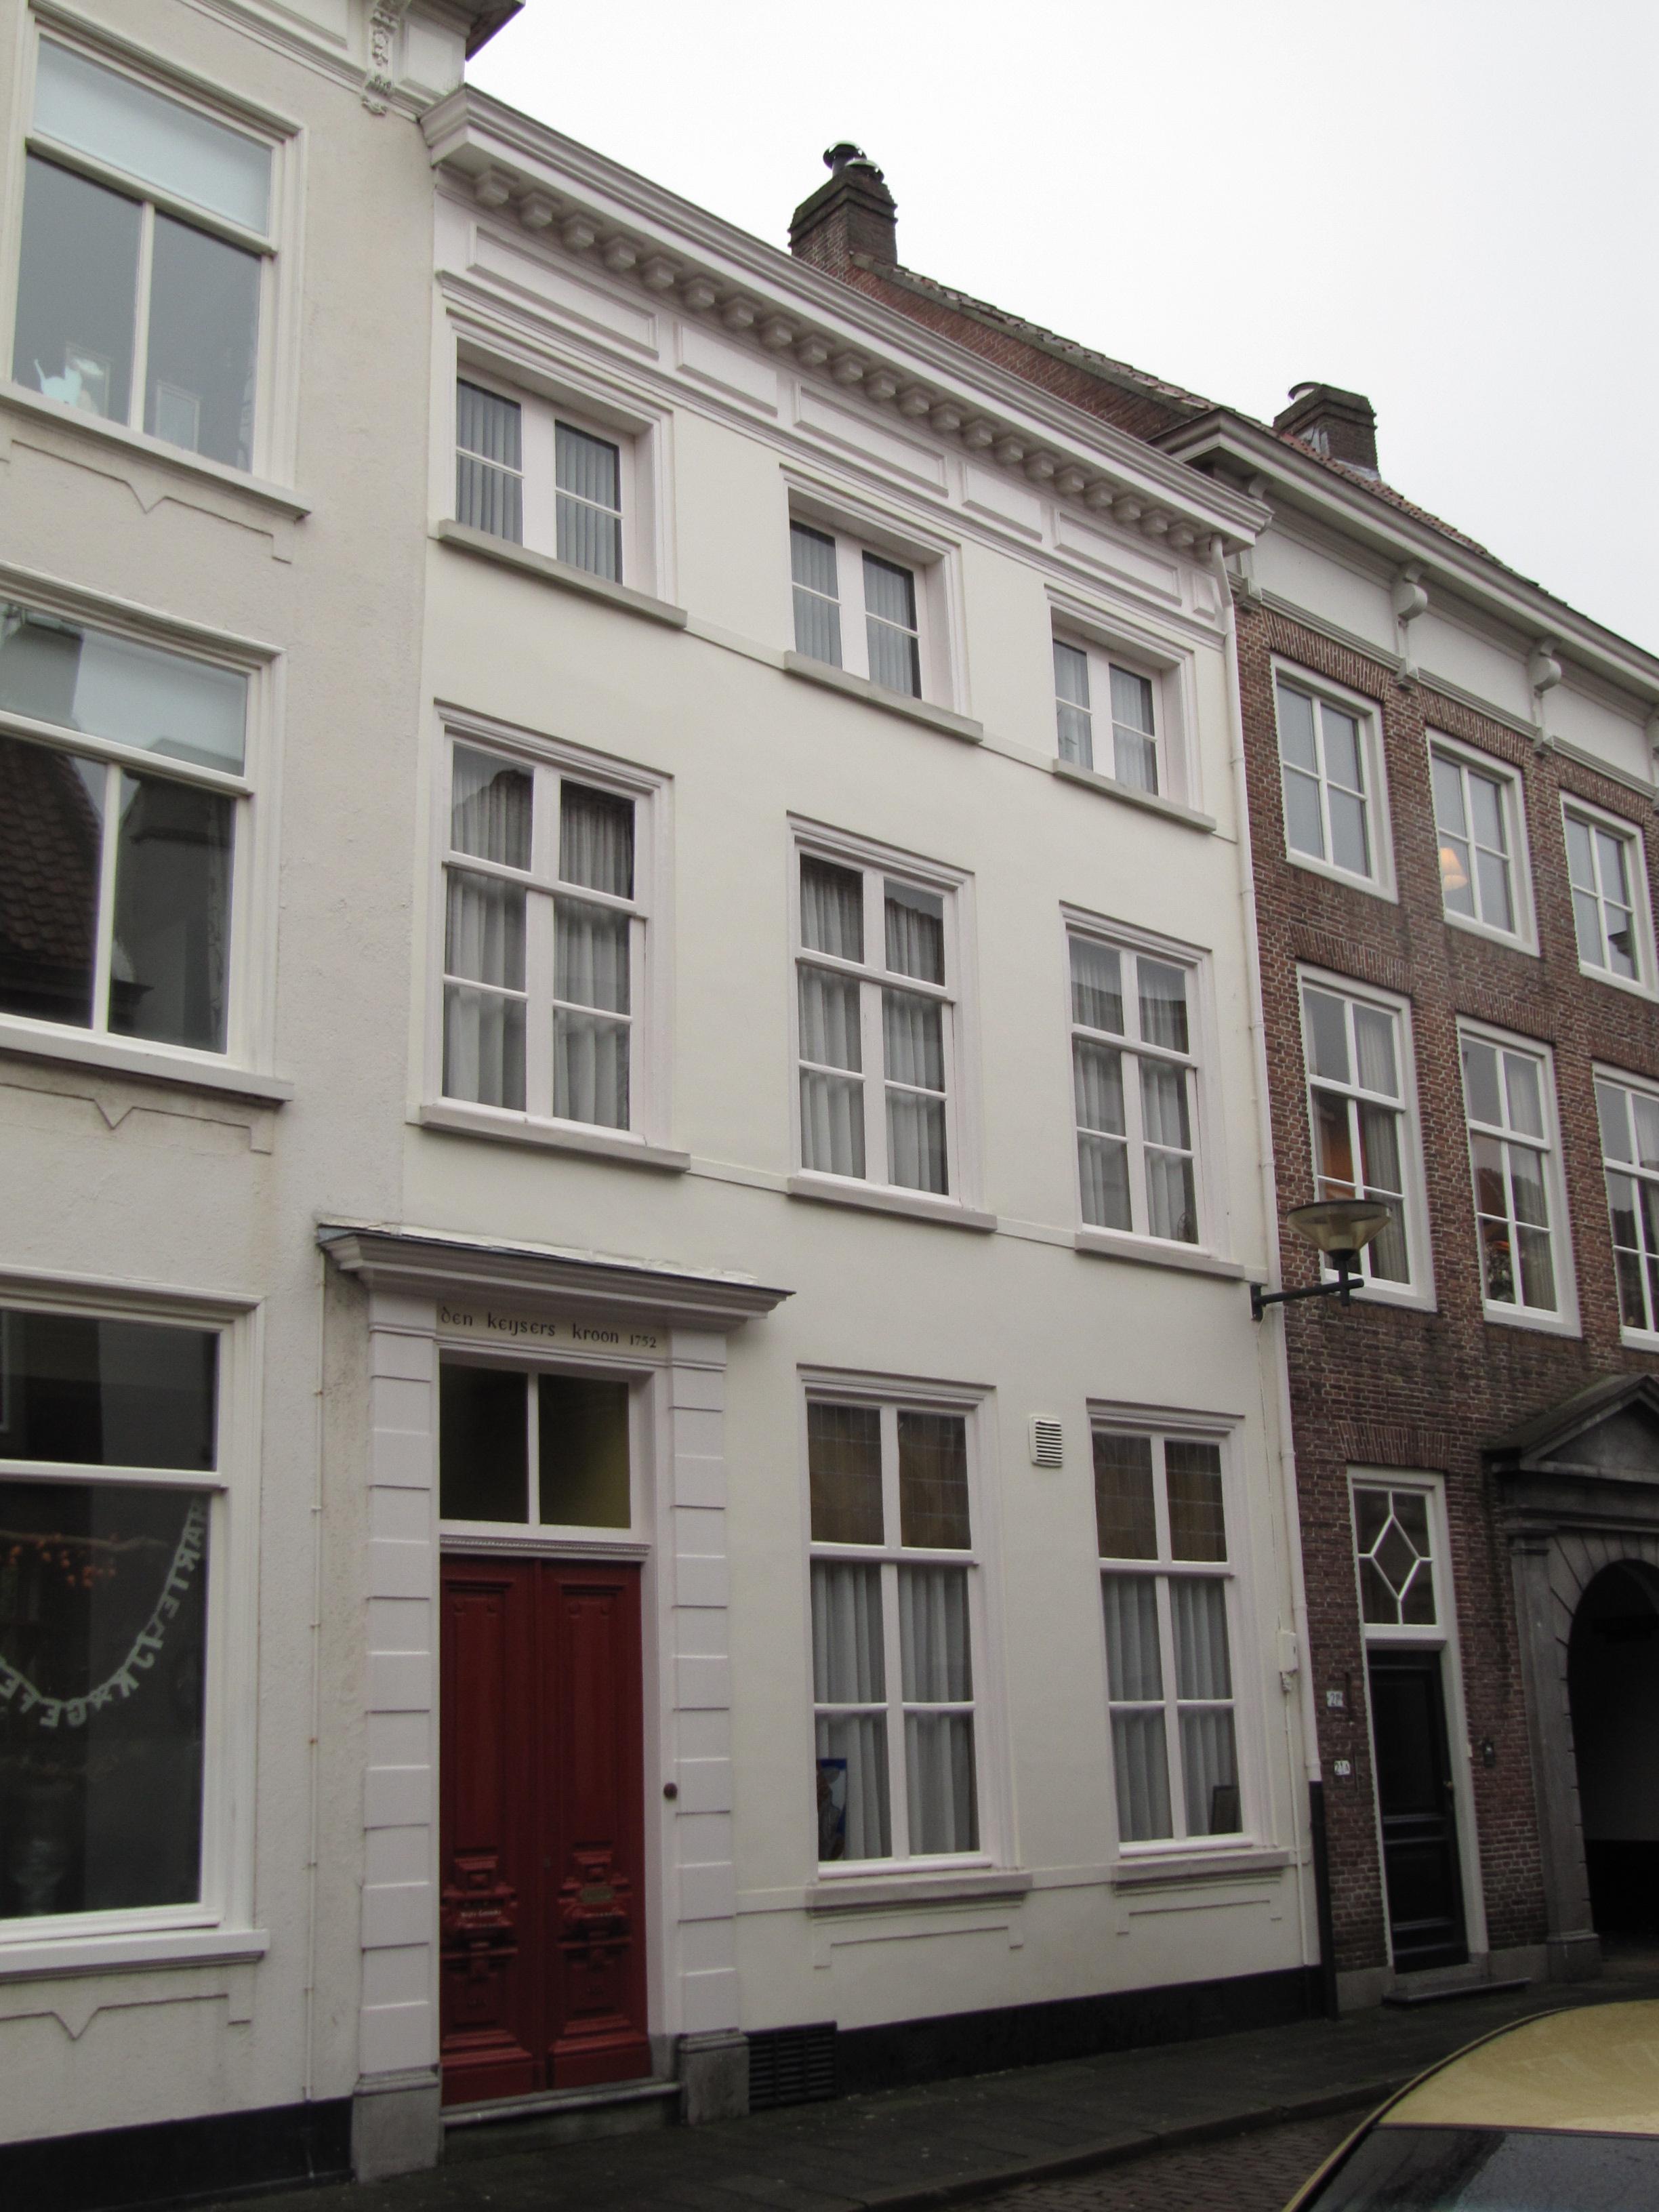 Huis met gepleisterde empire gevel kroonlijst op klossen ingang met geblokte pilasters in - Huis ingang ...